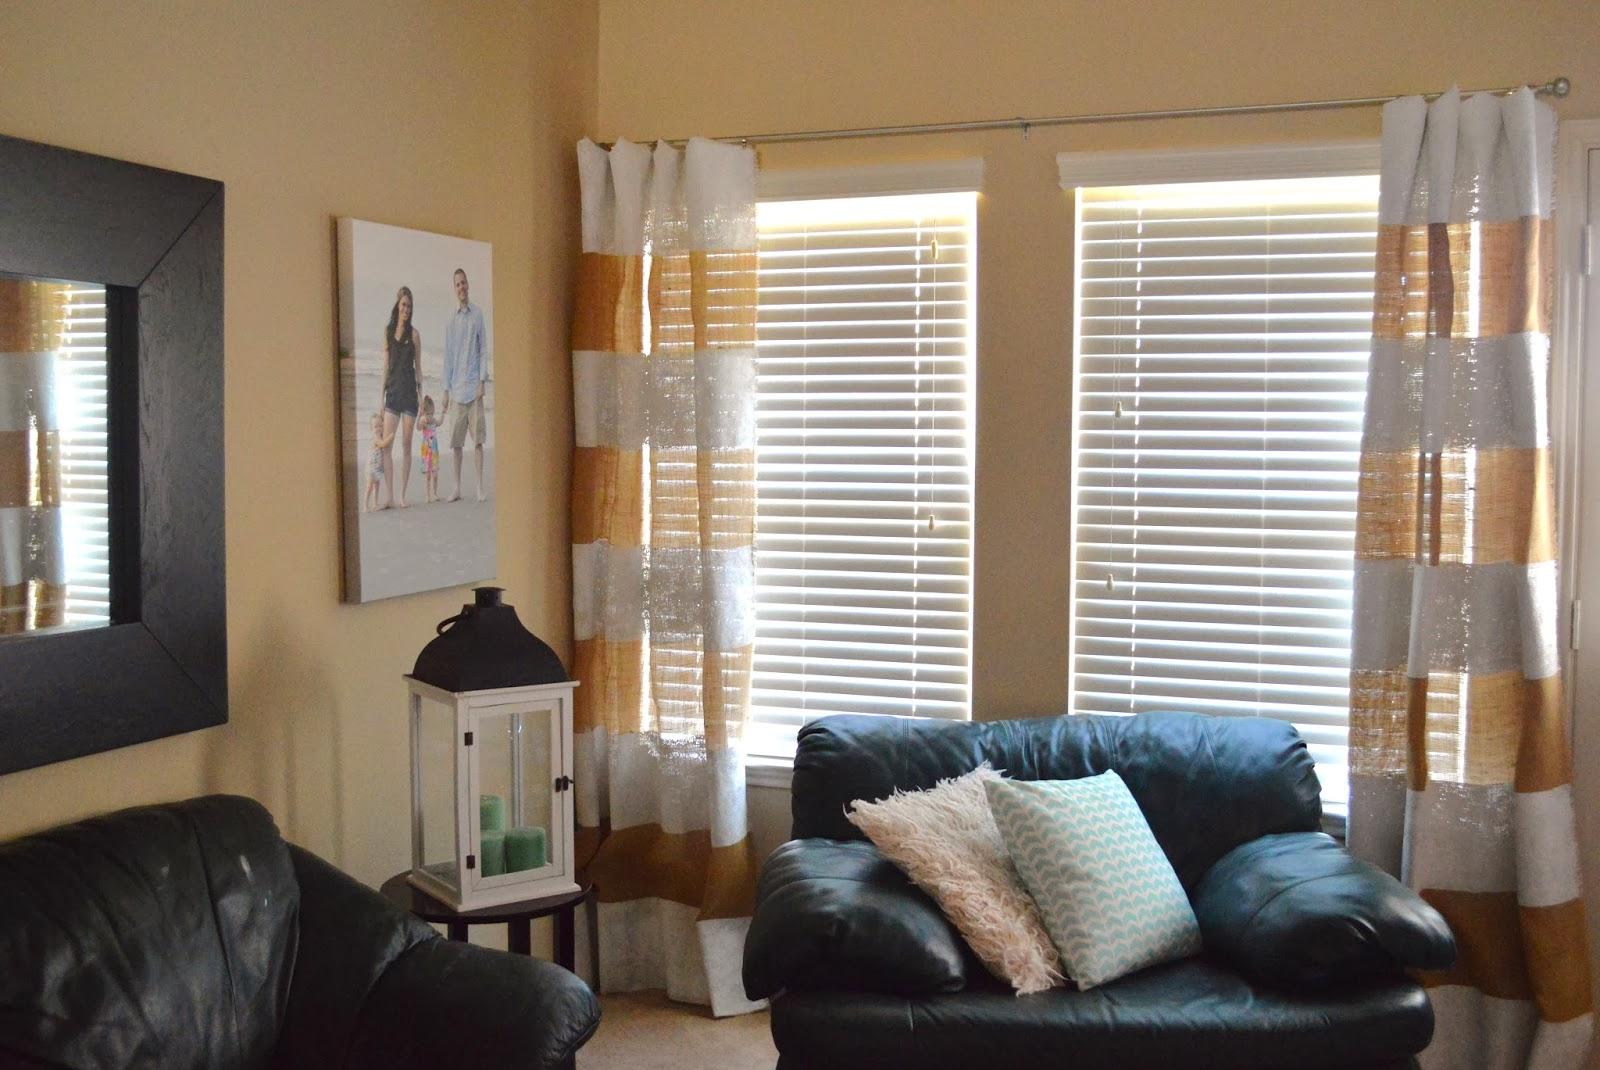 A diy life diy striped burlap curtains for Diy curtain ideas for living room